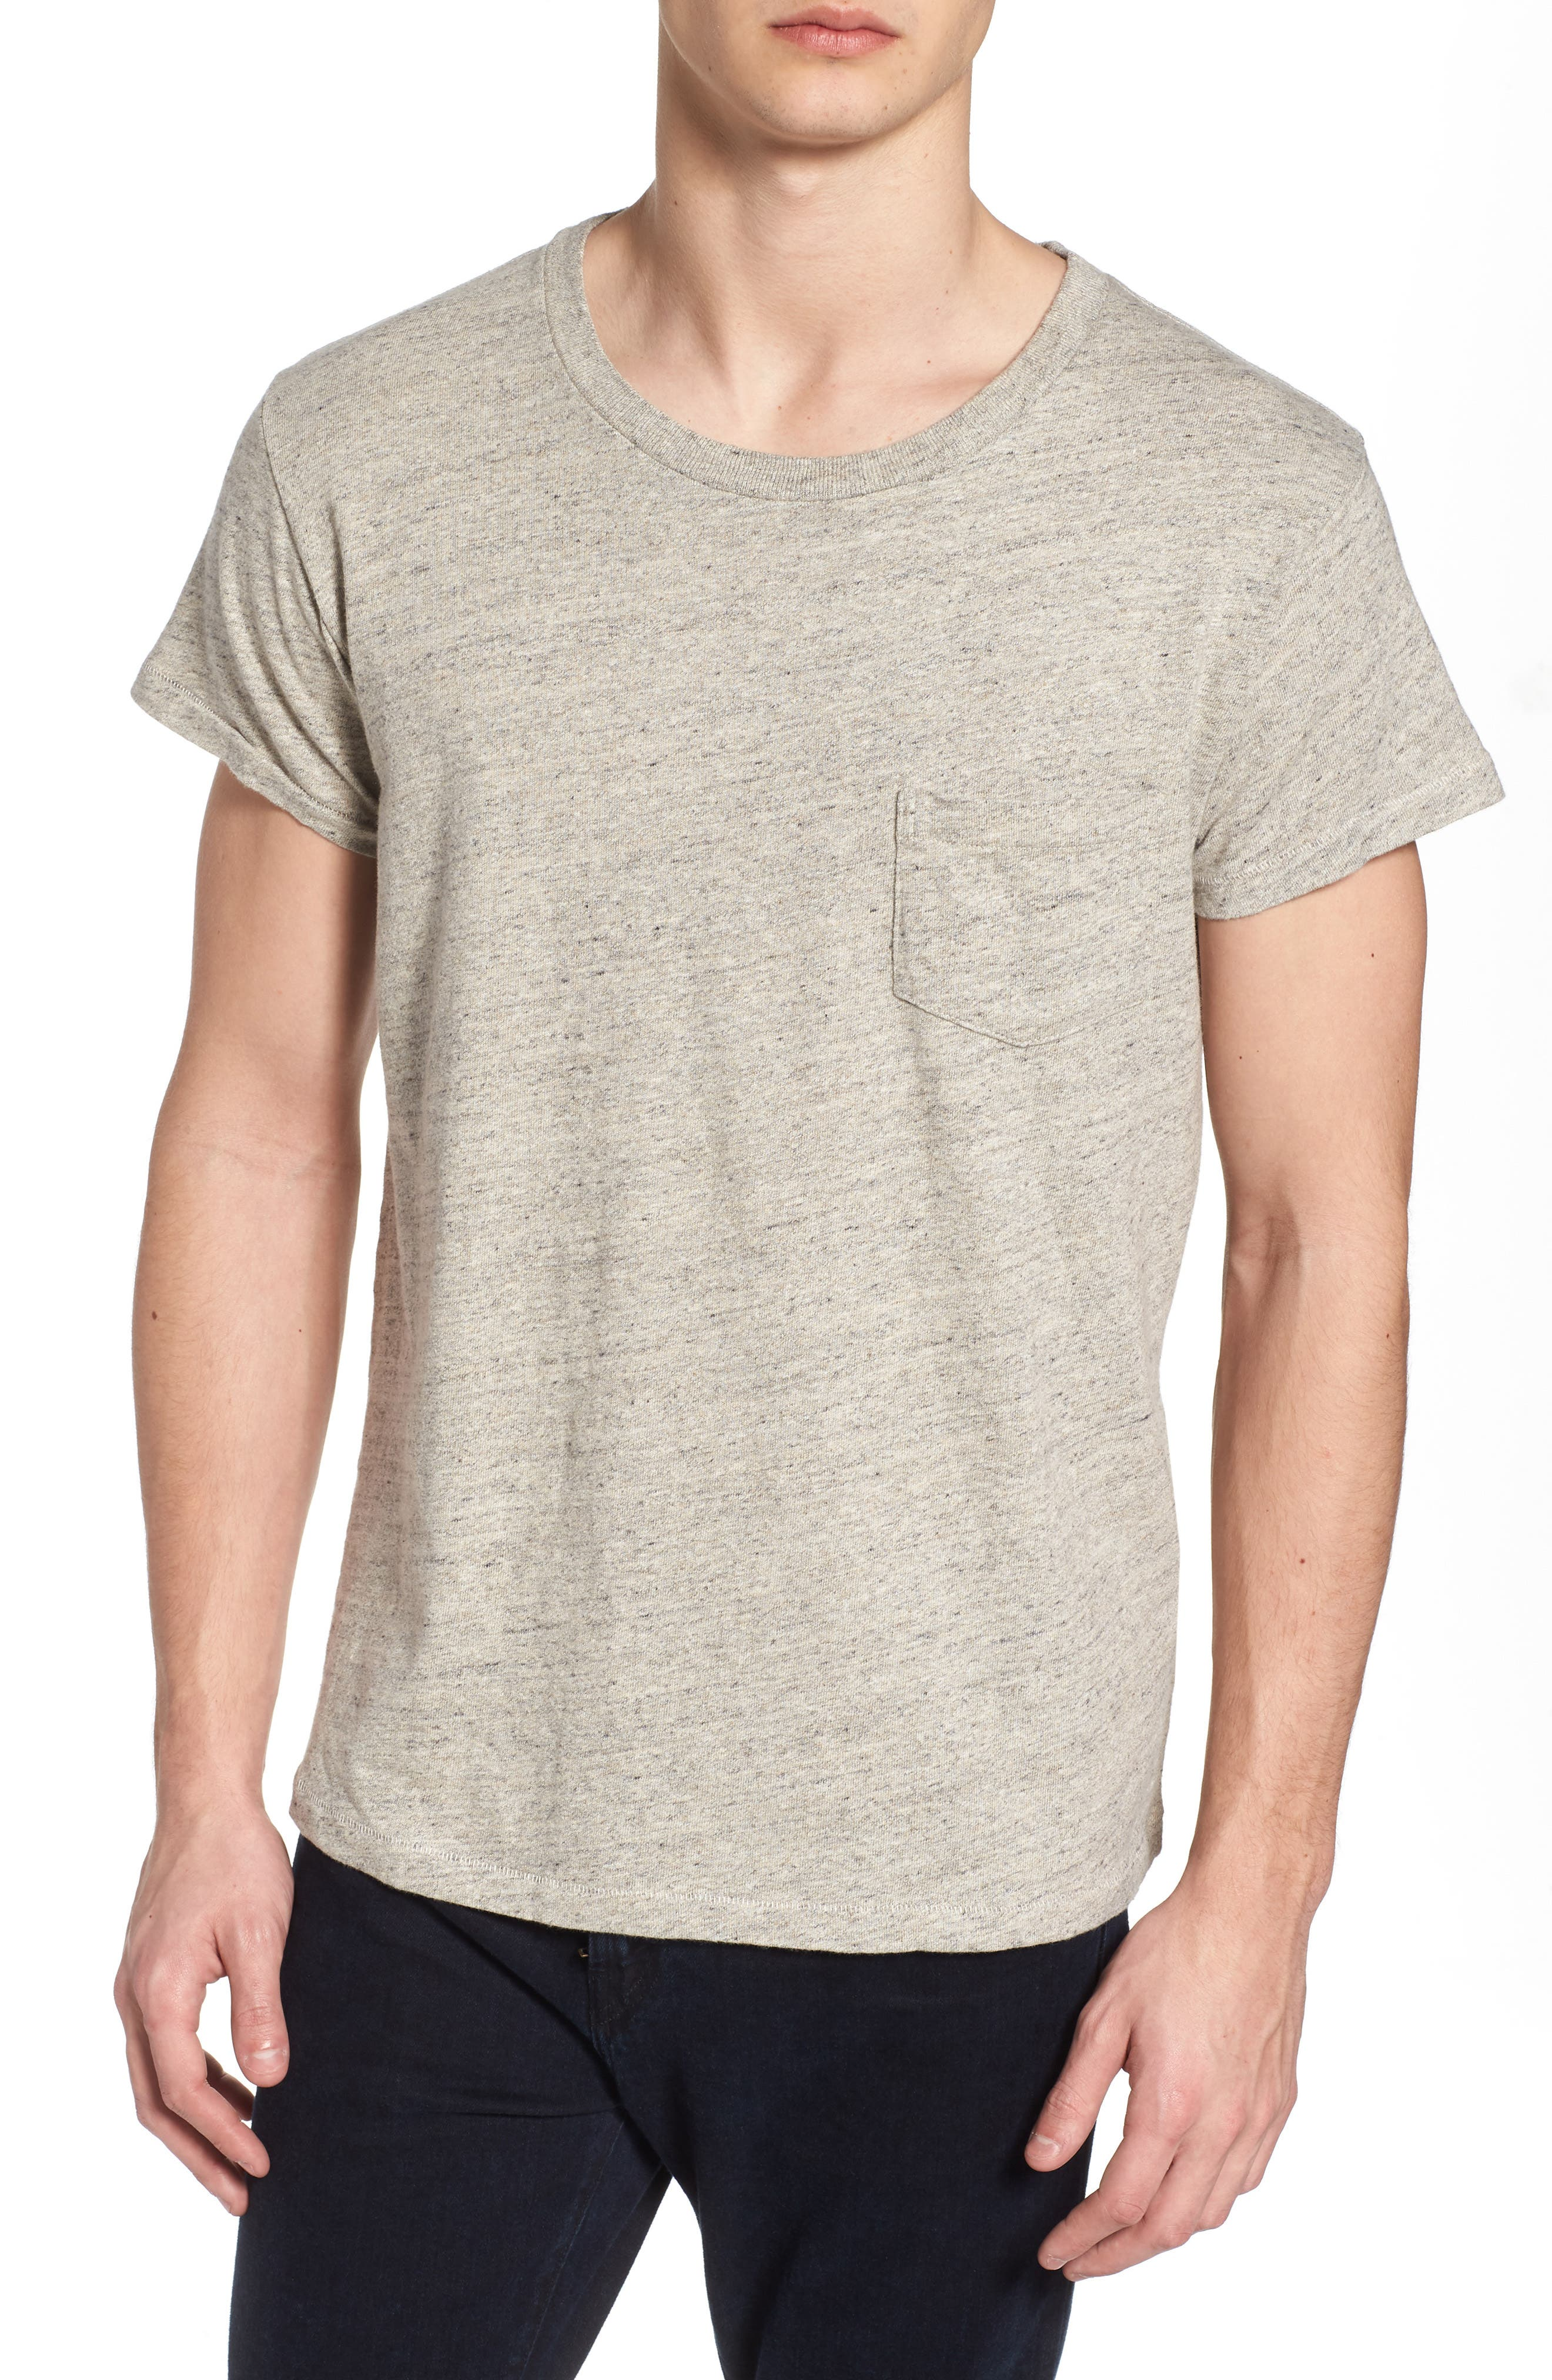 Levi's Vintage Clothing 1950s Sportswear Pocket T-Shirt,                         Main,                         color, Grey